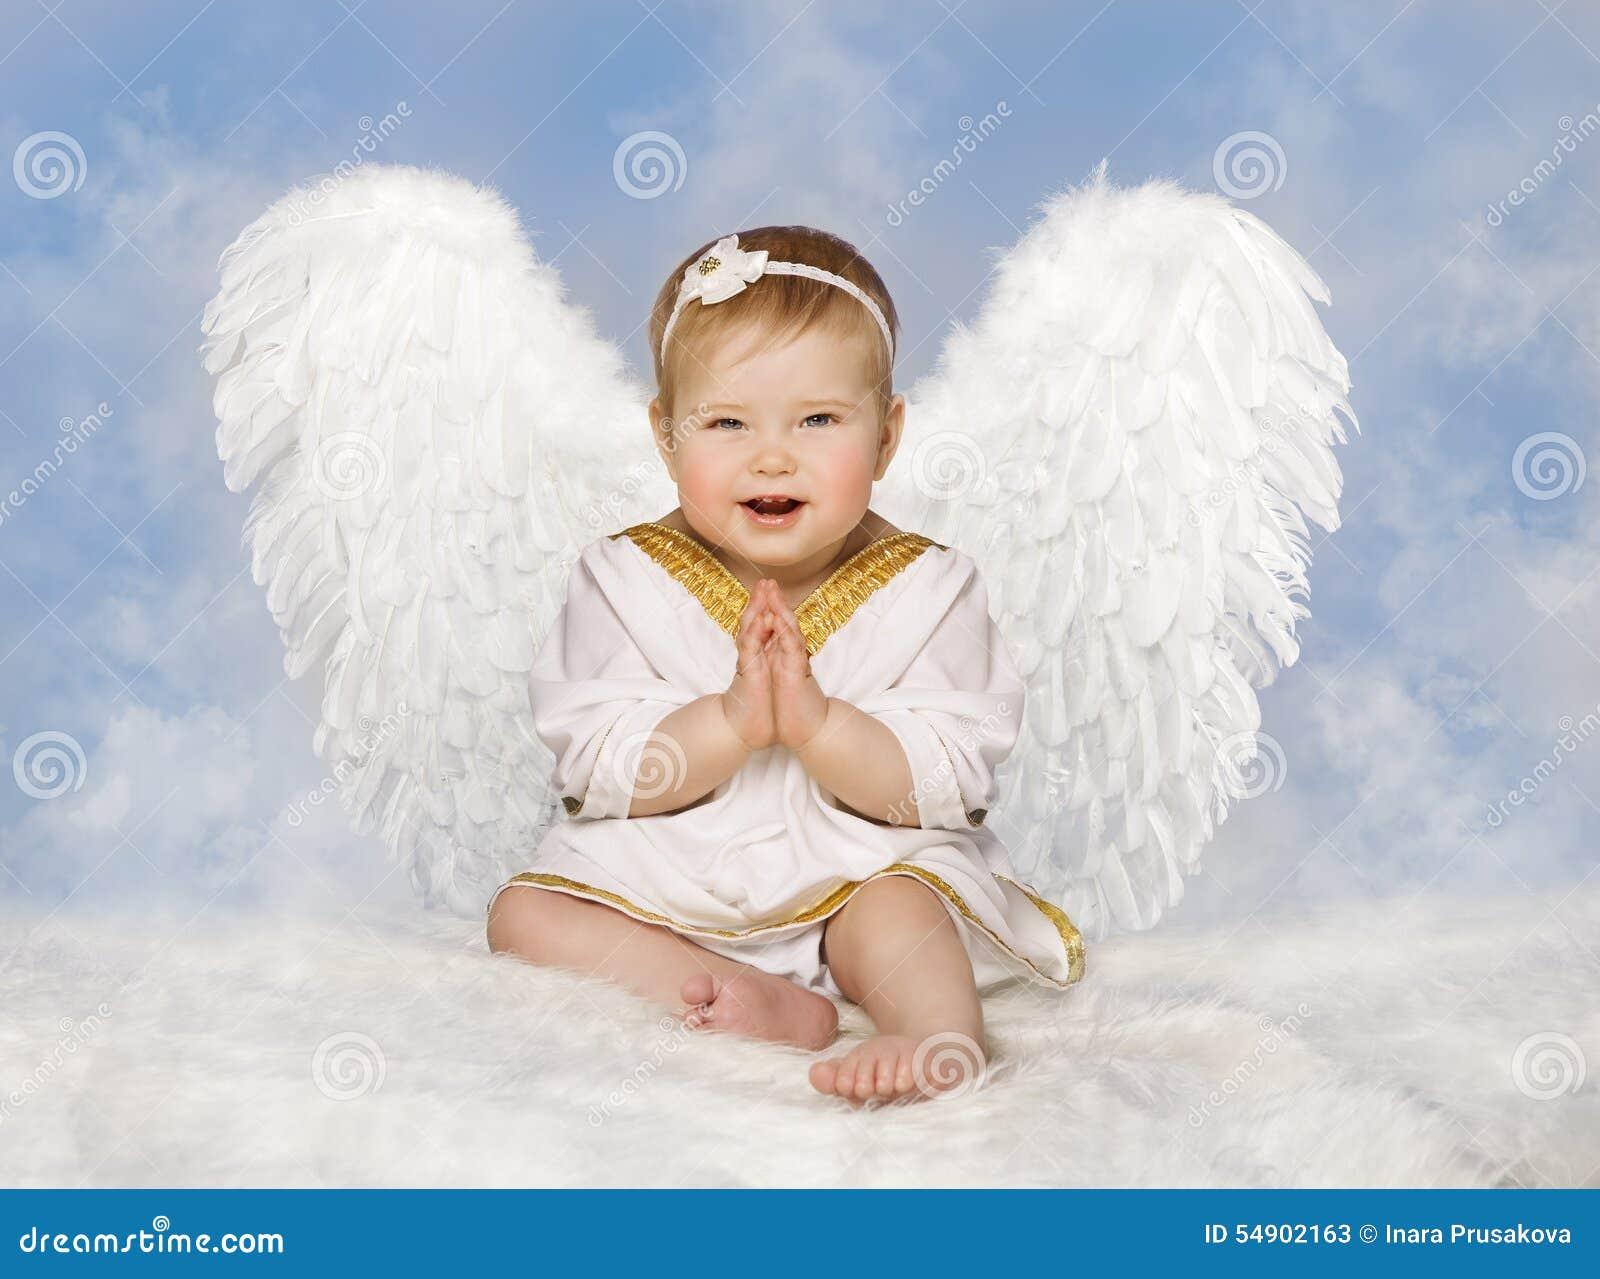 Angel Baby Wings, Mani Di Angelic Cupid Toddler Kid ...